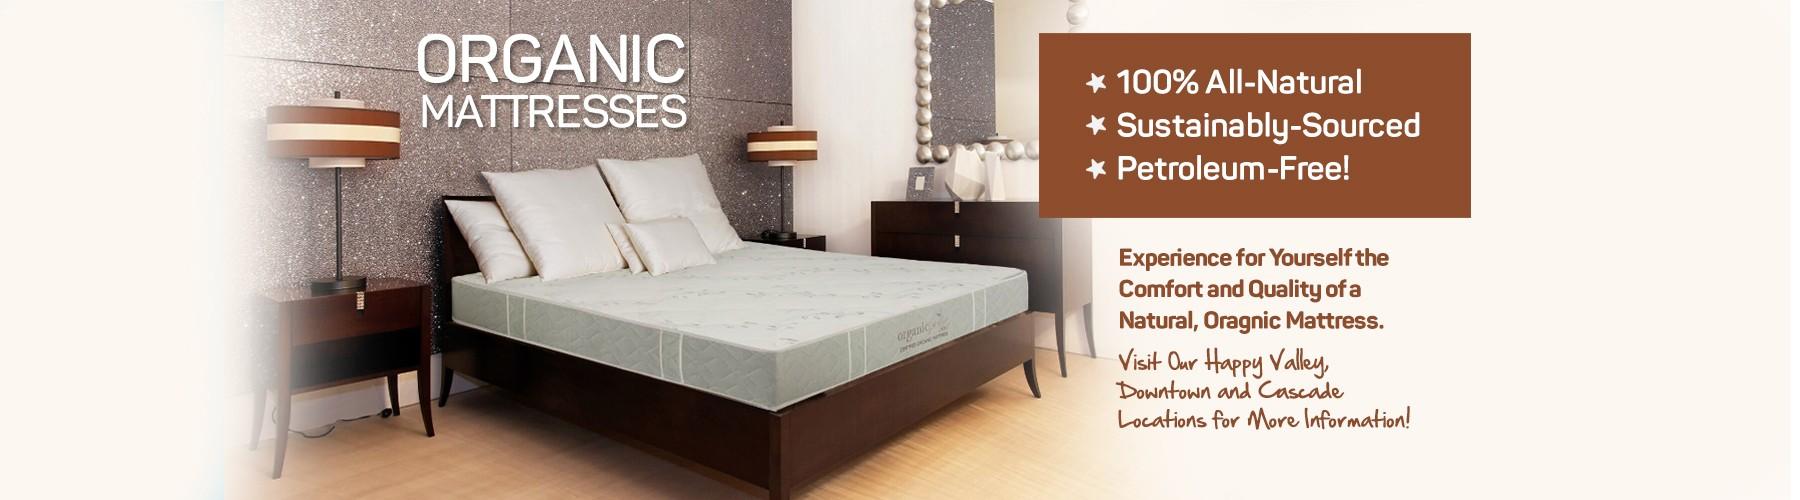 Organic Bedroom Furniture Organic Mattresses Inc Portland Or Mattress World Northwest